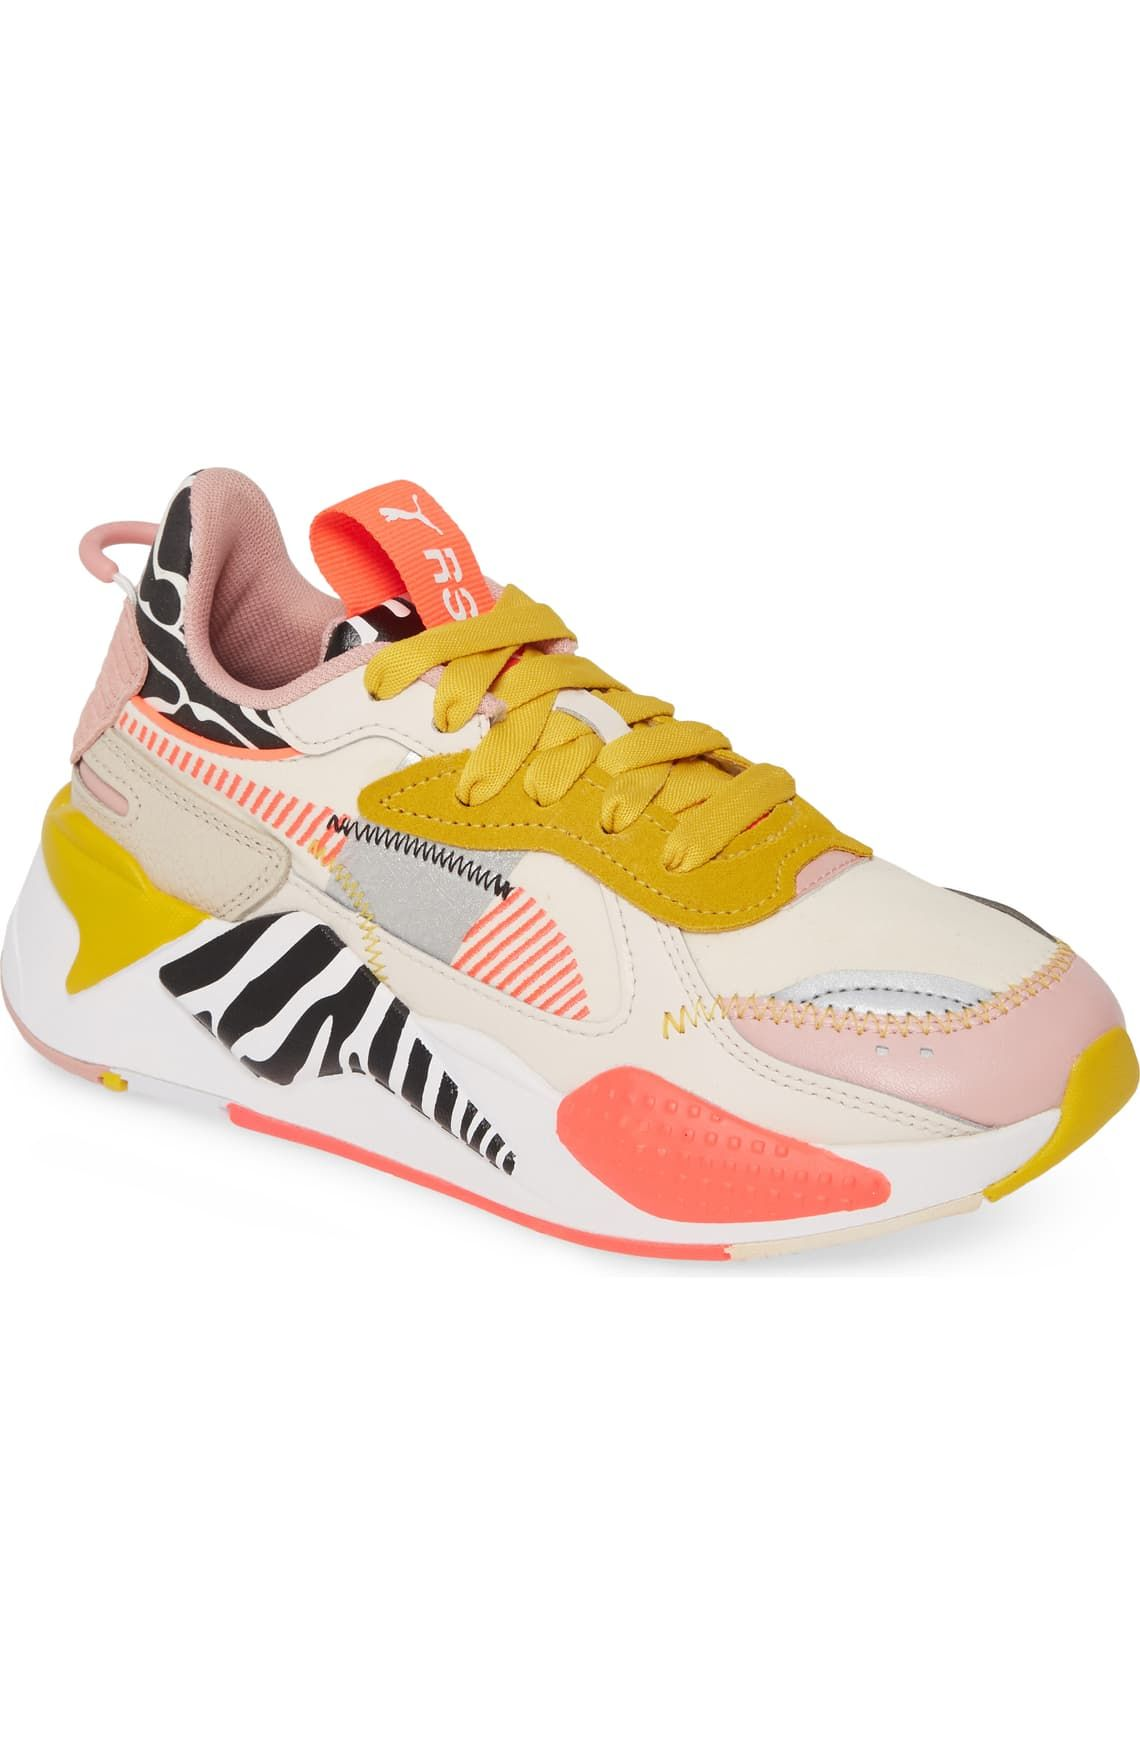 PUMA RS-X Unexpected Mixes Sneaker